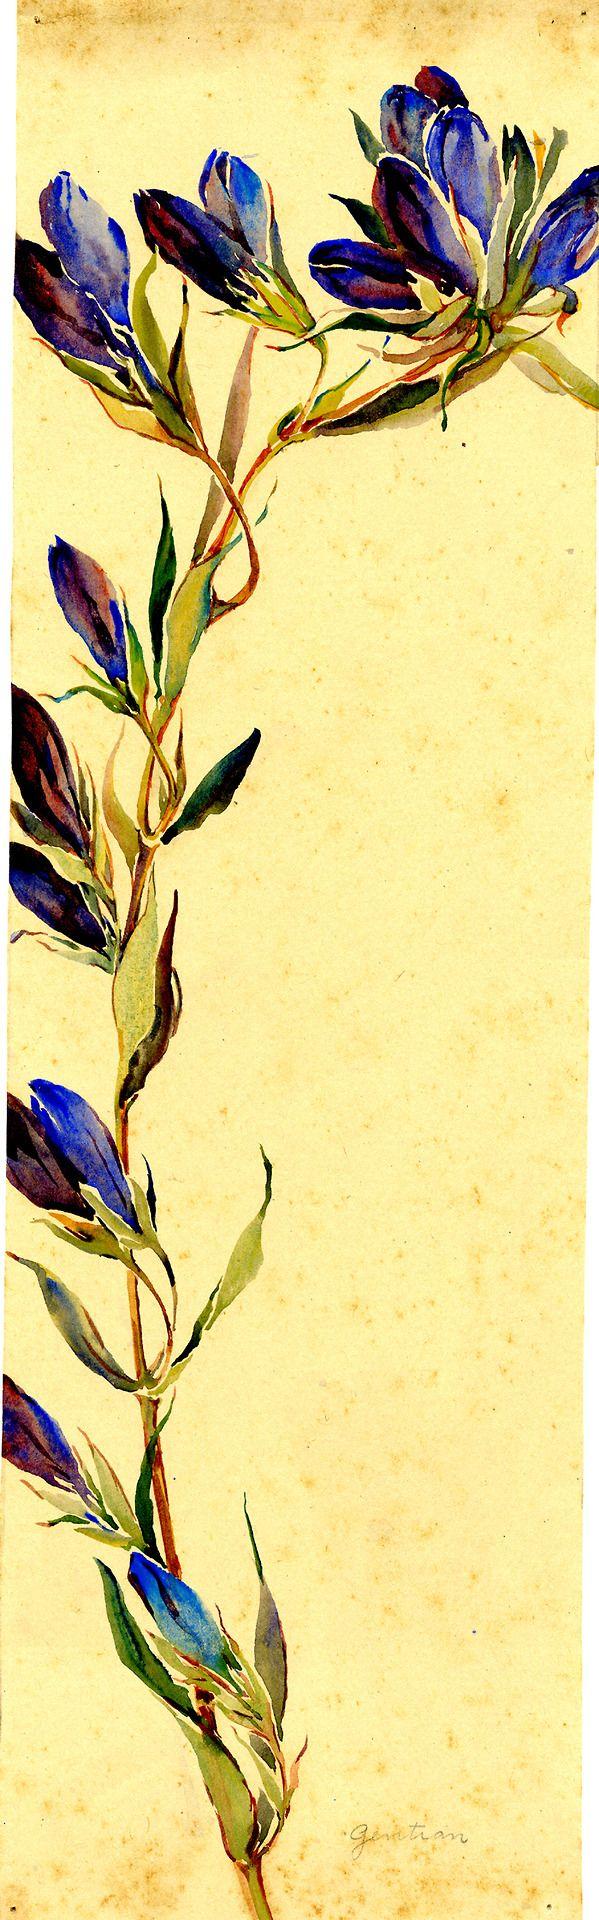 Watercolor, Gentian, by Alice Ravenel Huger Smith, a Charleston Renaissance artist. Charleston Museum